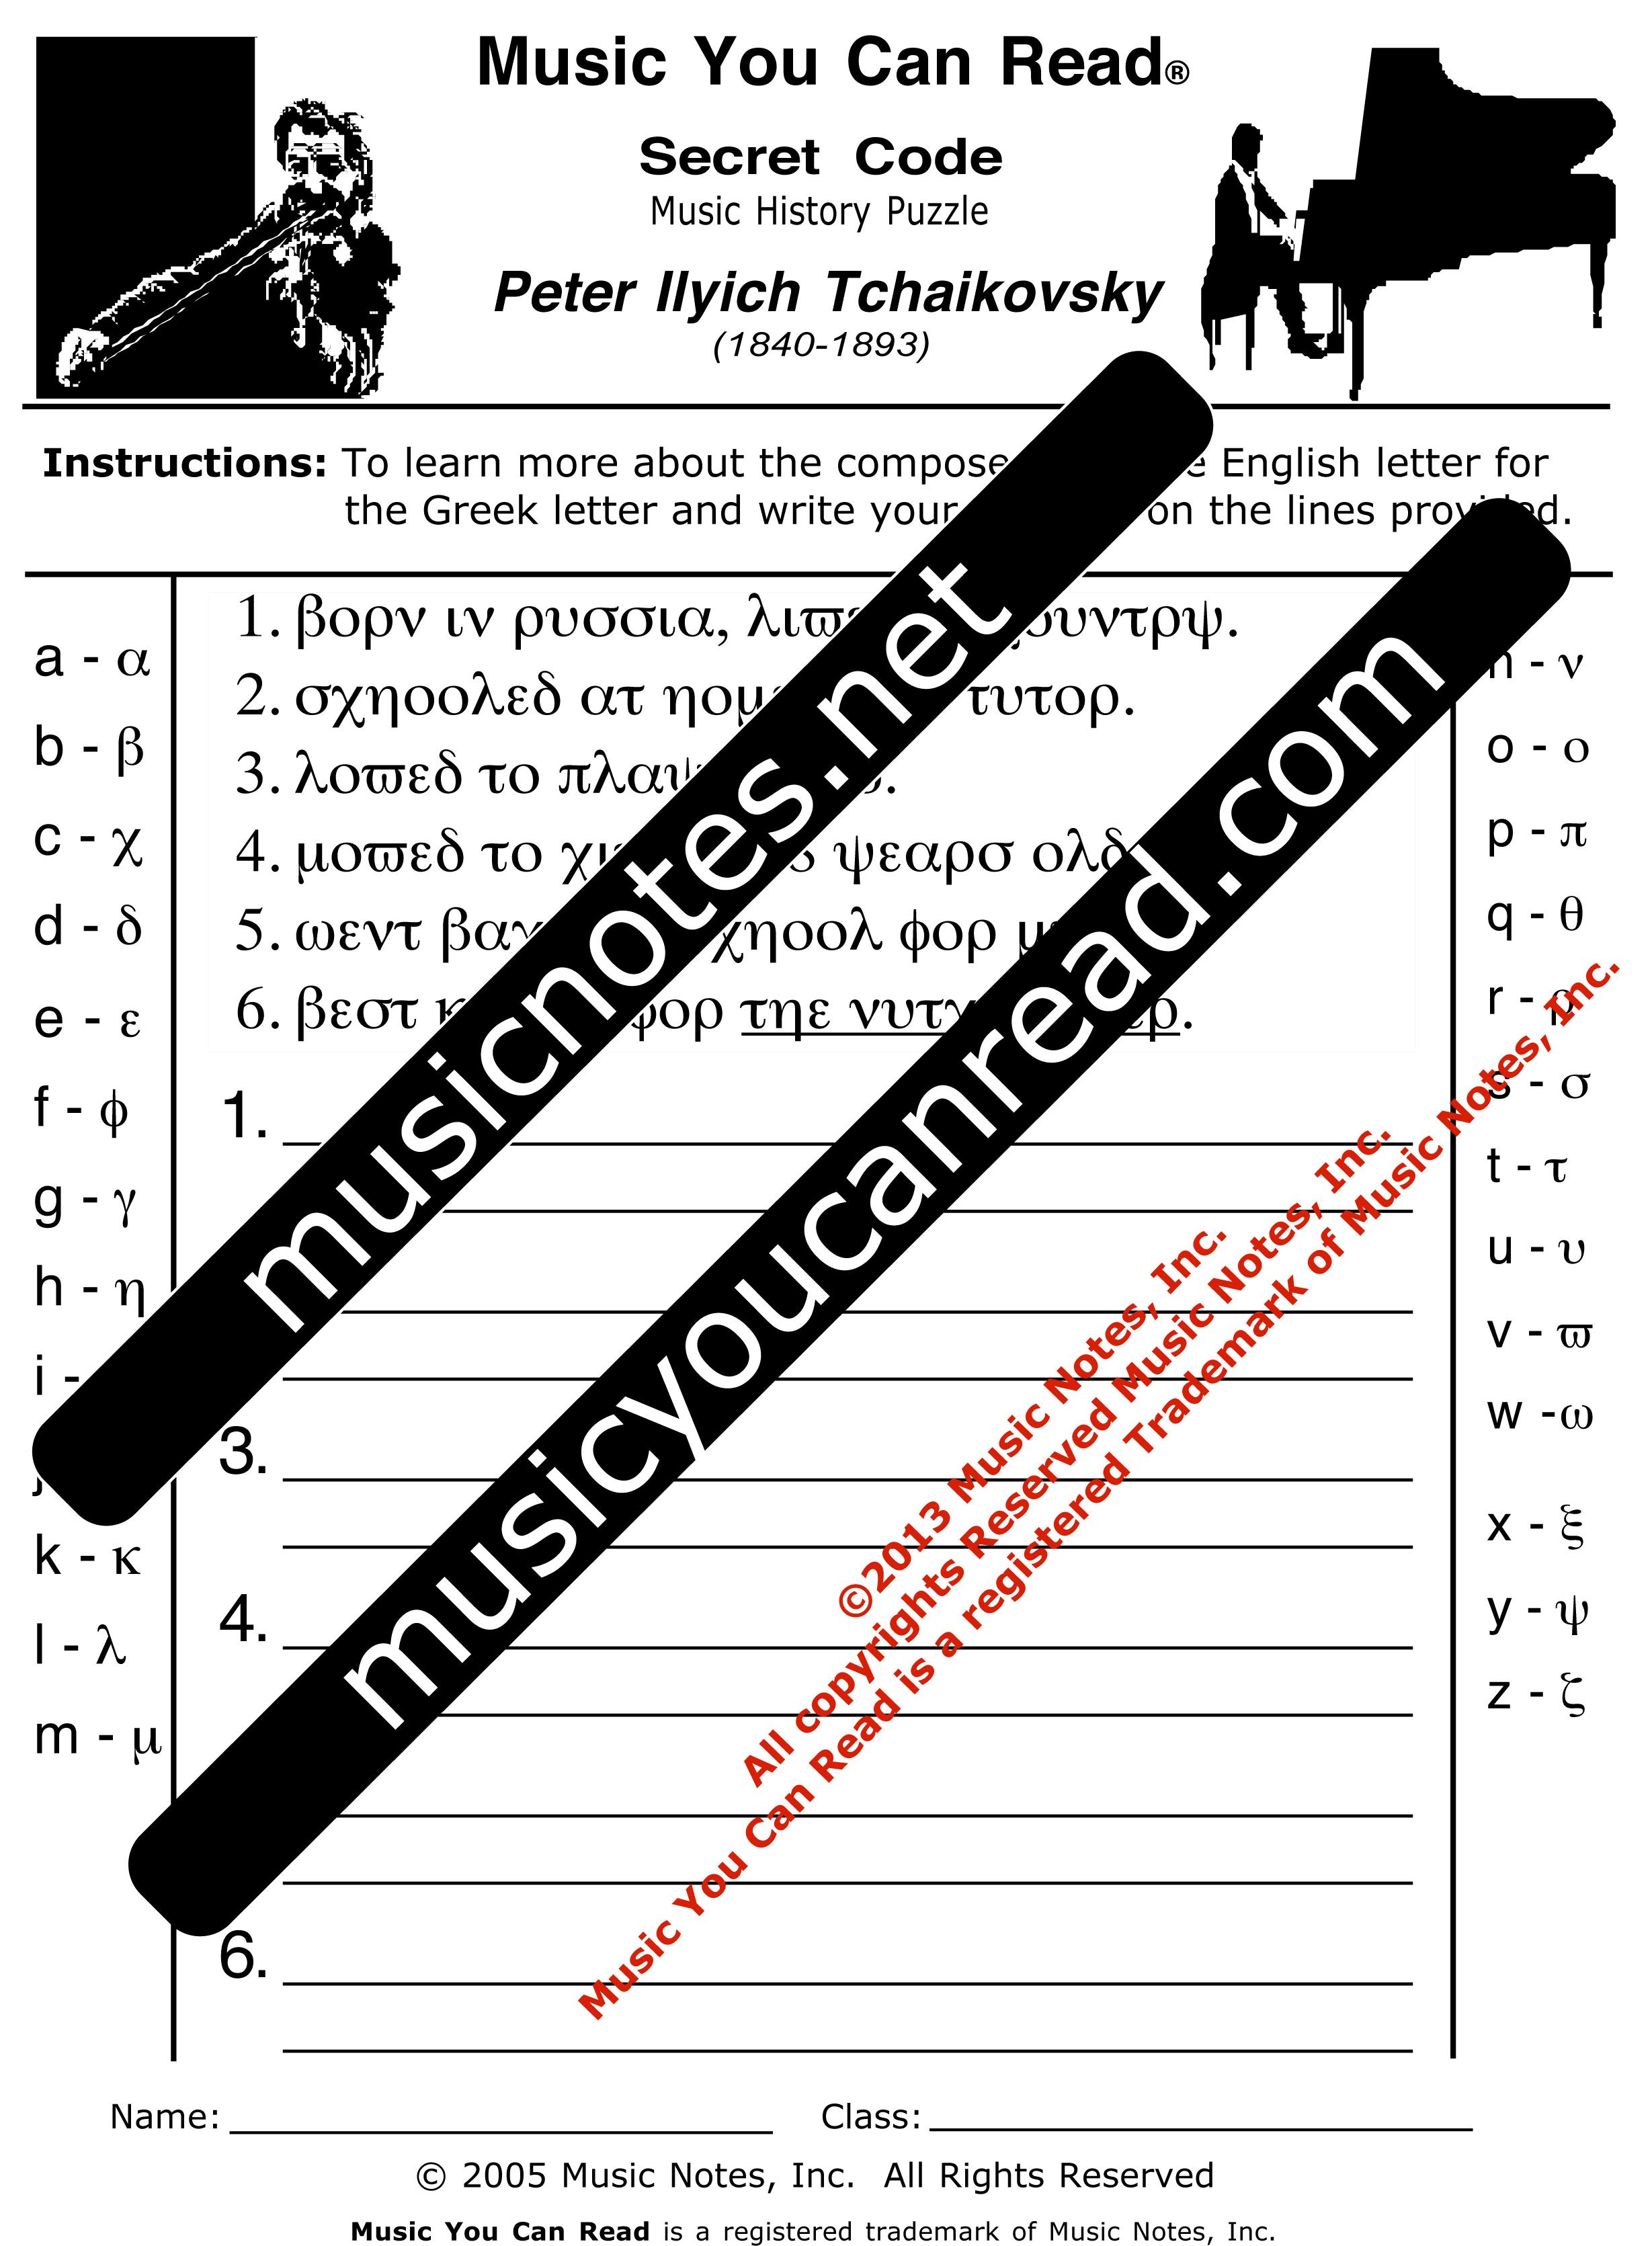 Secret Code – Peter Ilyich Tchaikovsky